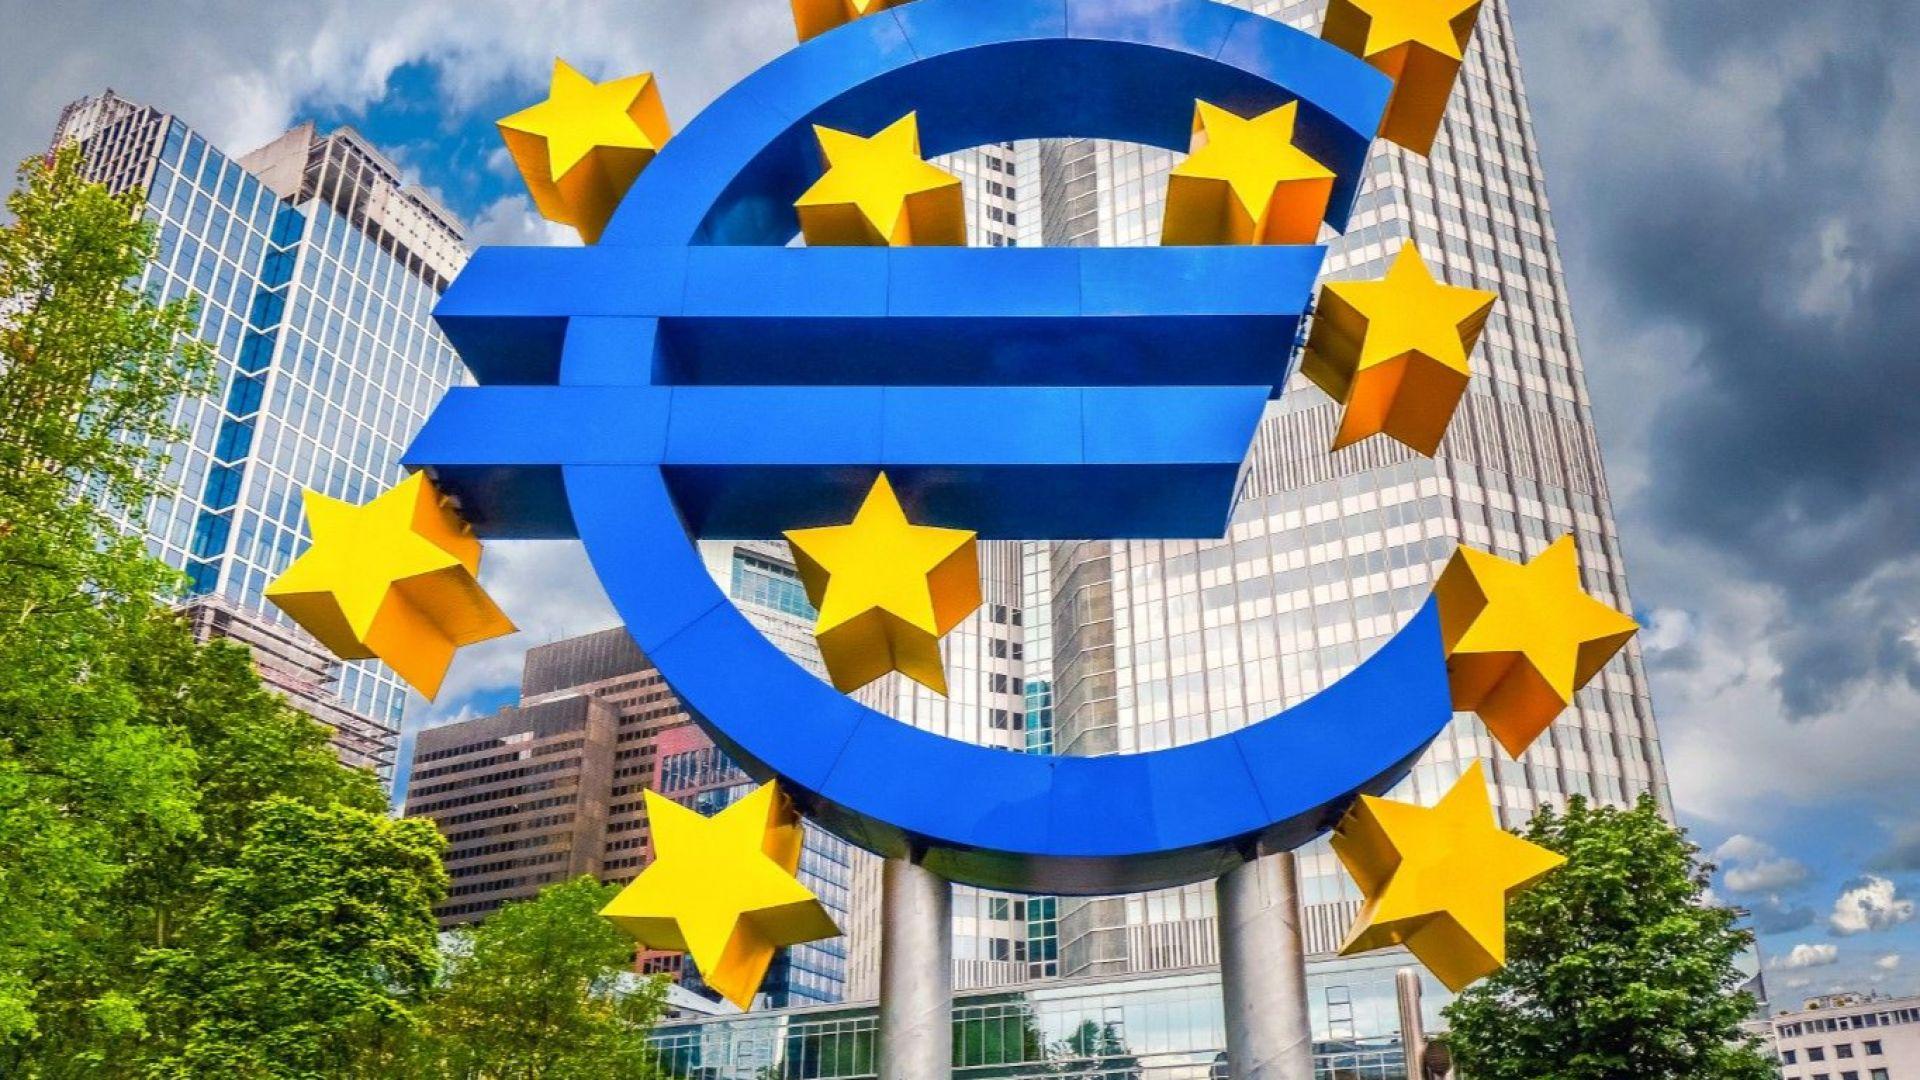 ЕЦБ охлади ентусиазма ни за еврозоната